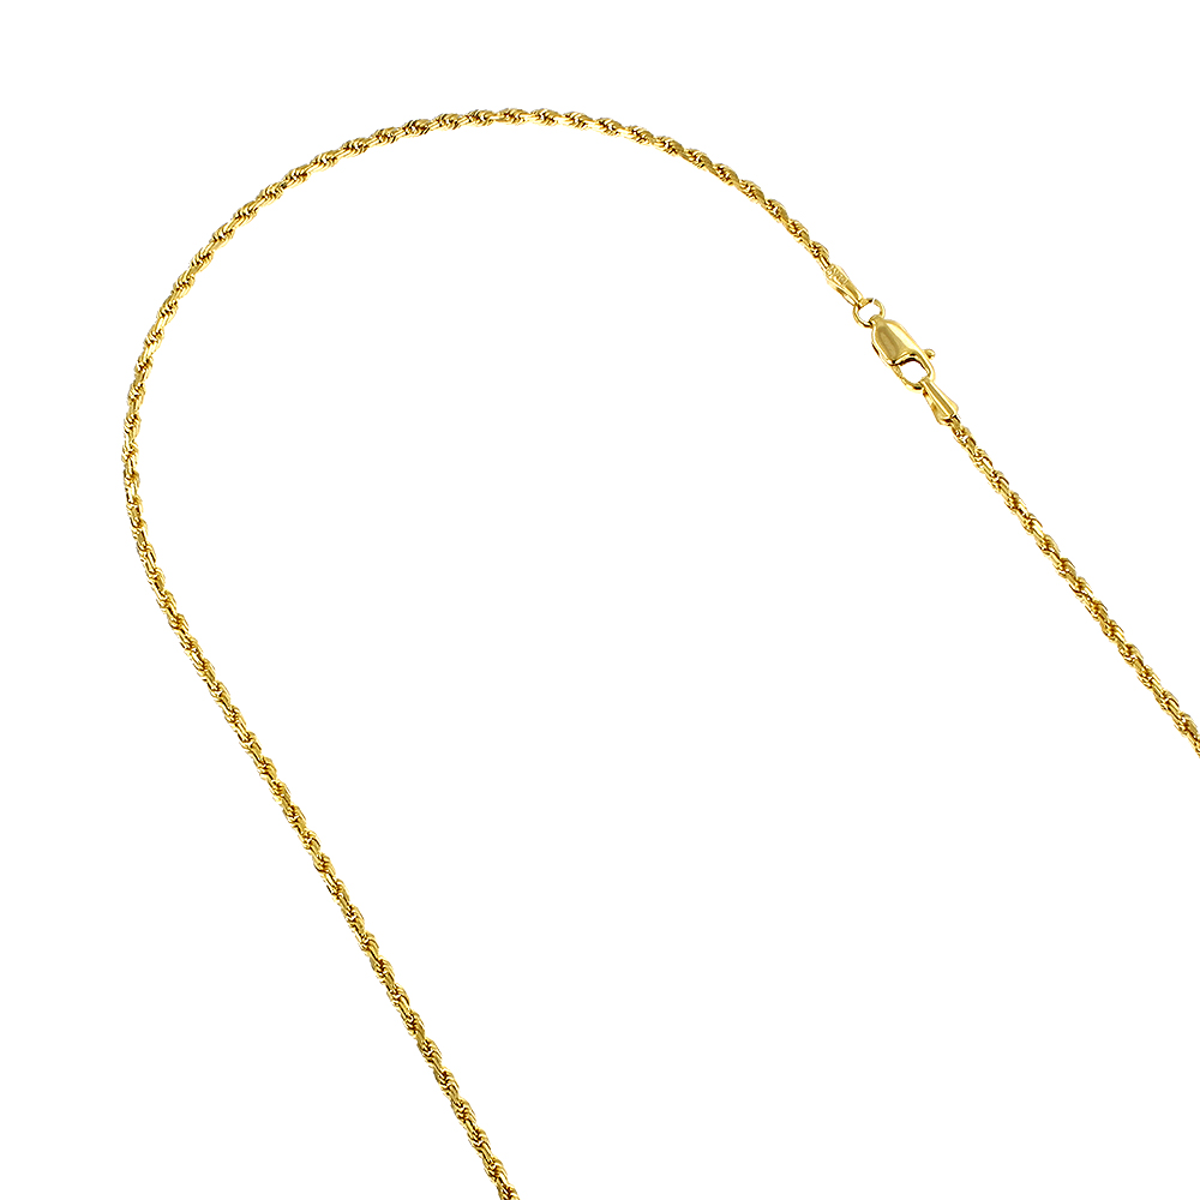 LUXURMAN Solid 14k Gold Rope Chain For Men & Women 2mm Wide